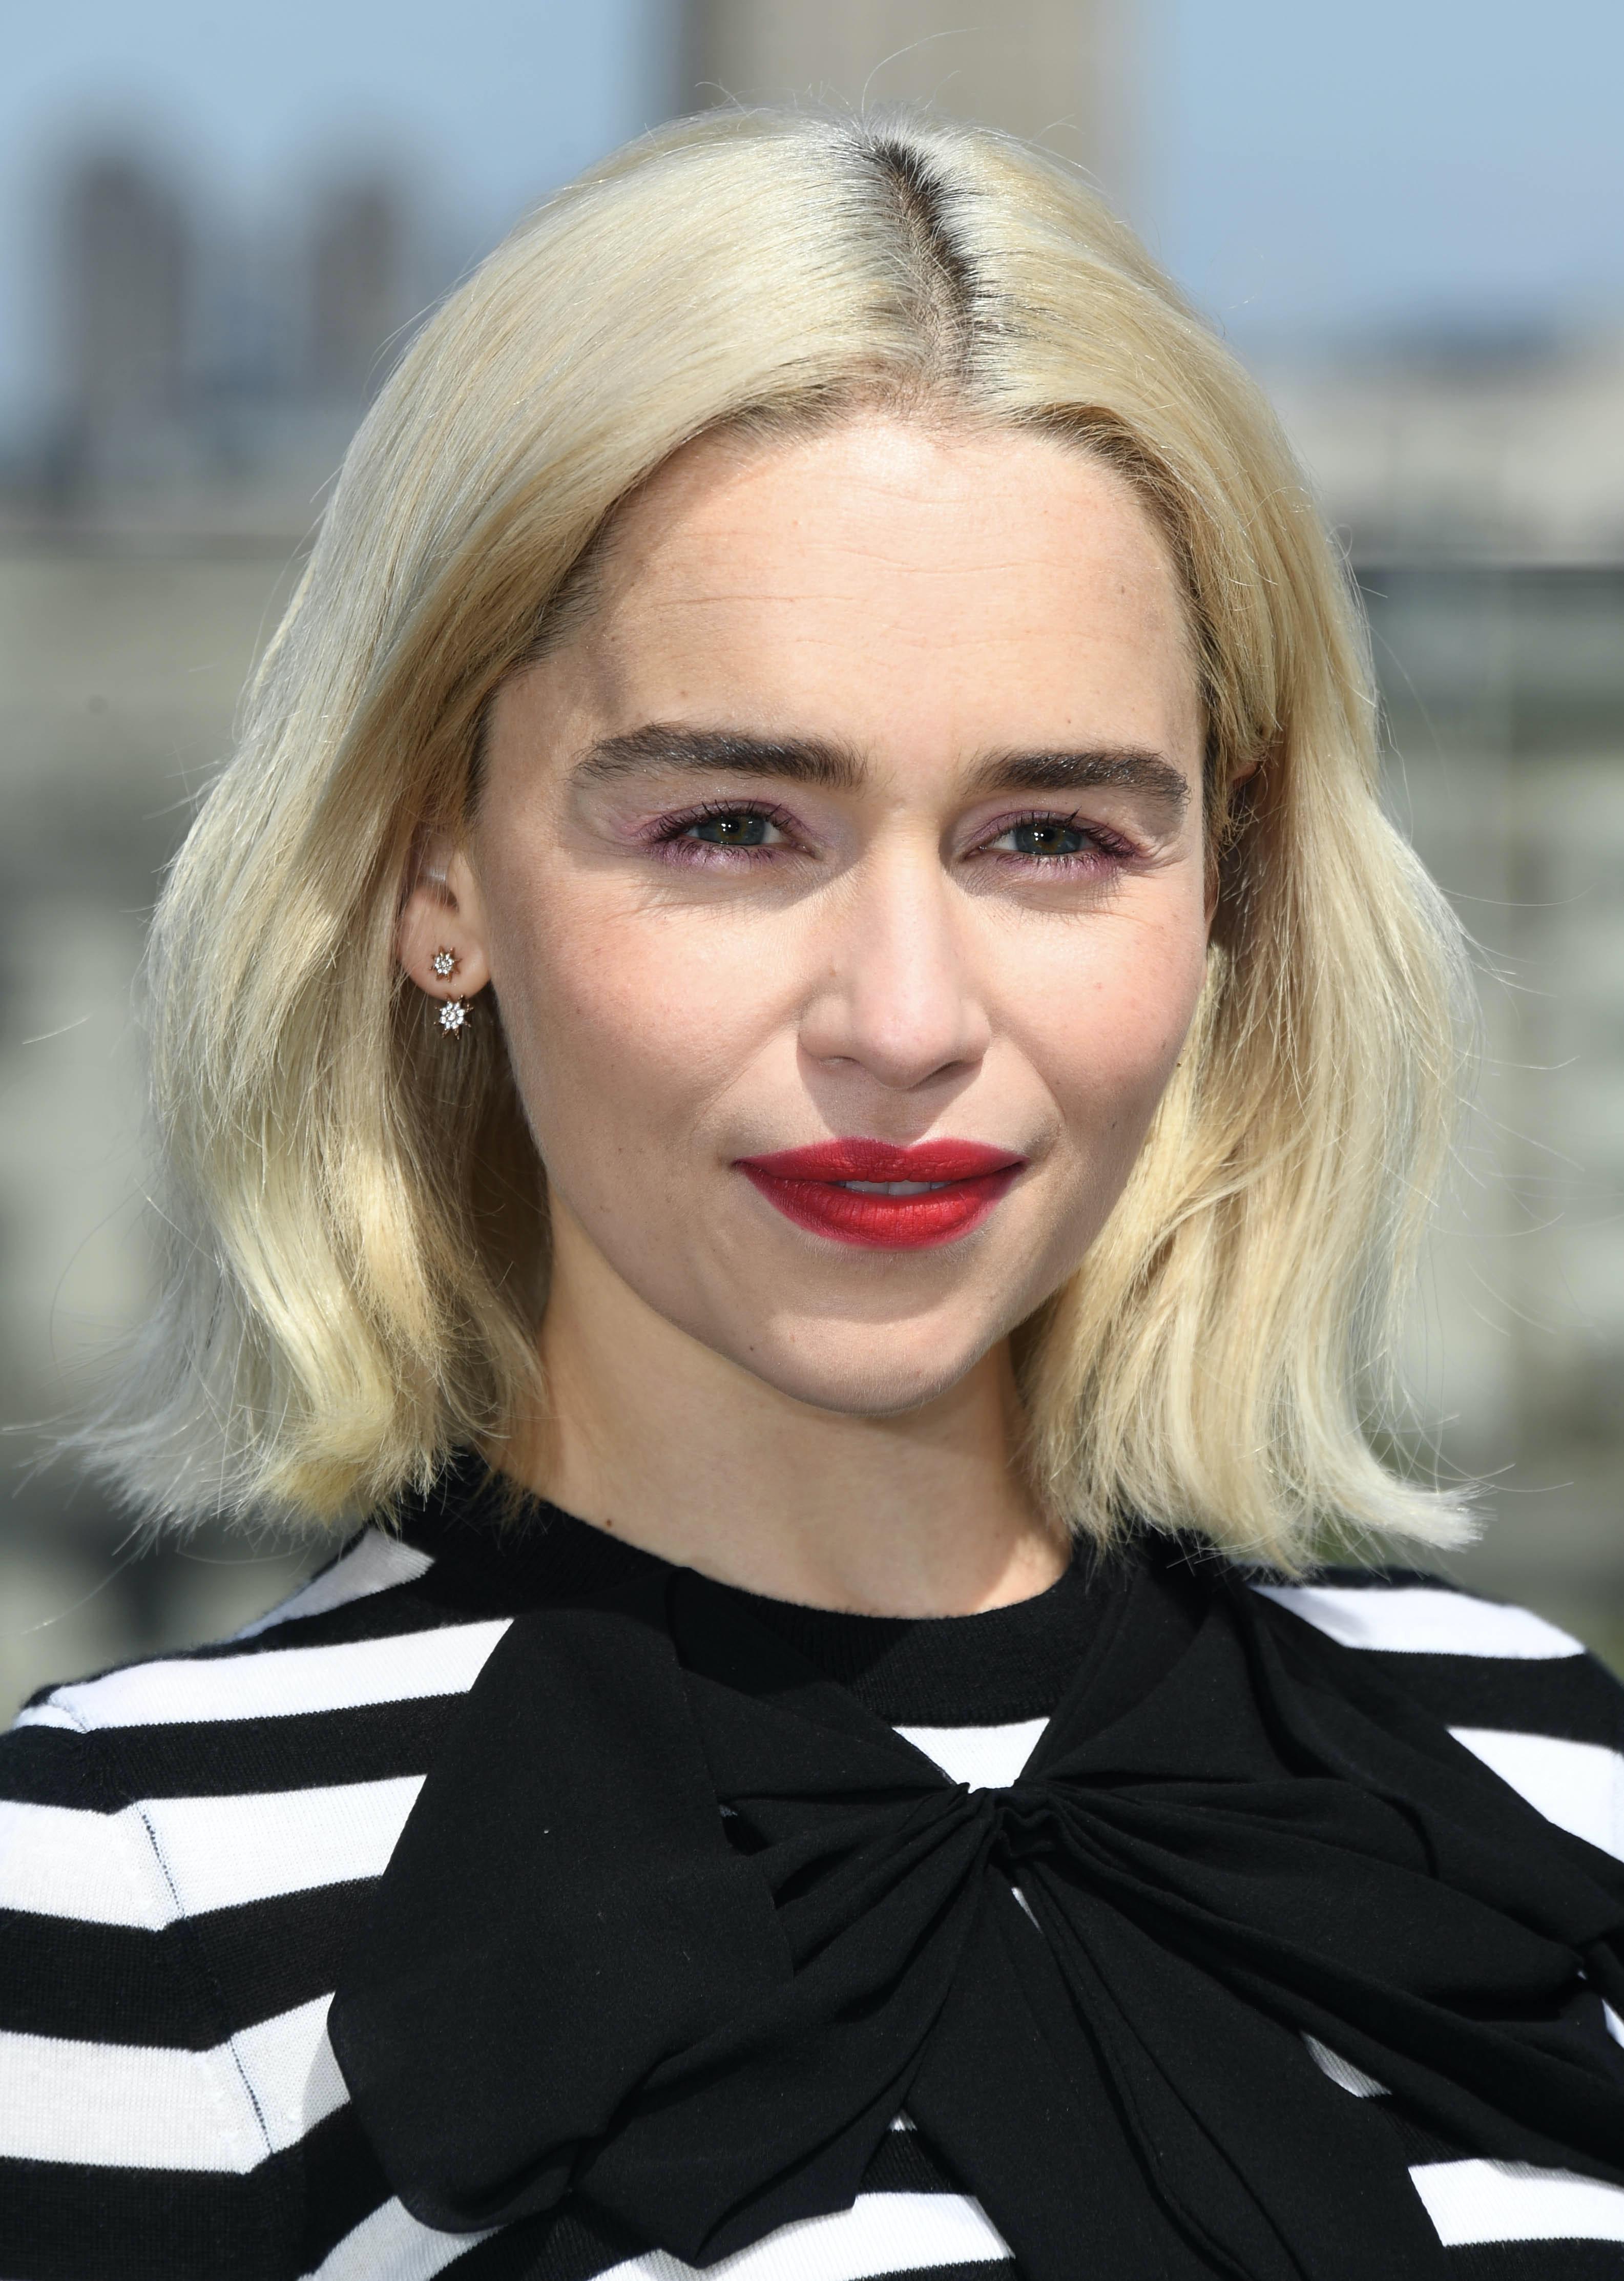 Emilia Clarke S New Pixie Cut Is A Far Far Cry From Her Long Khaleesi Locks